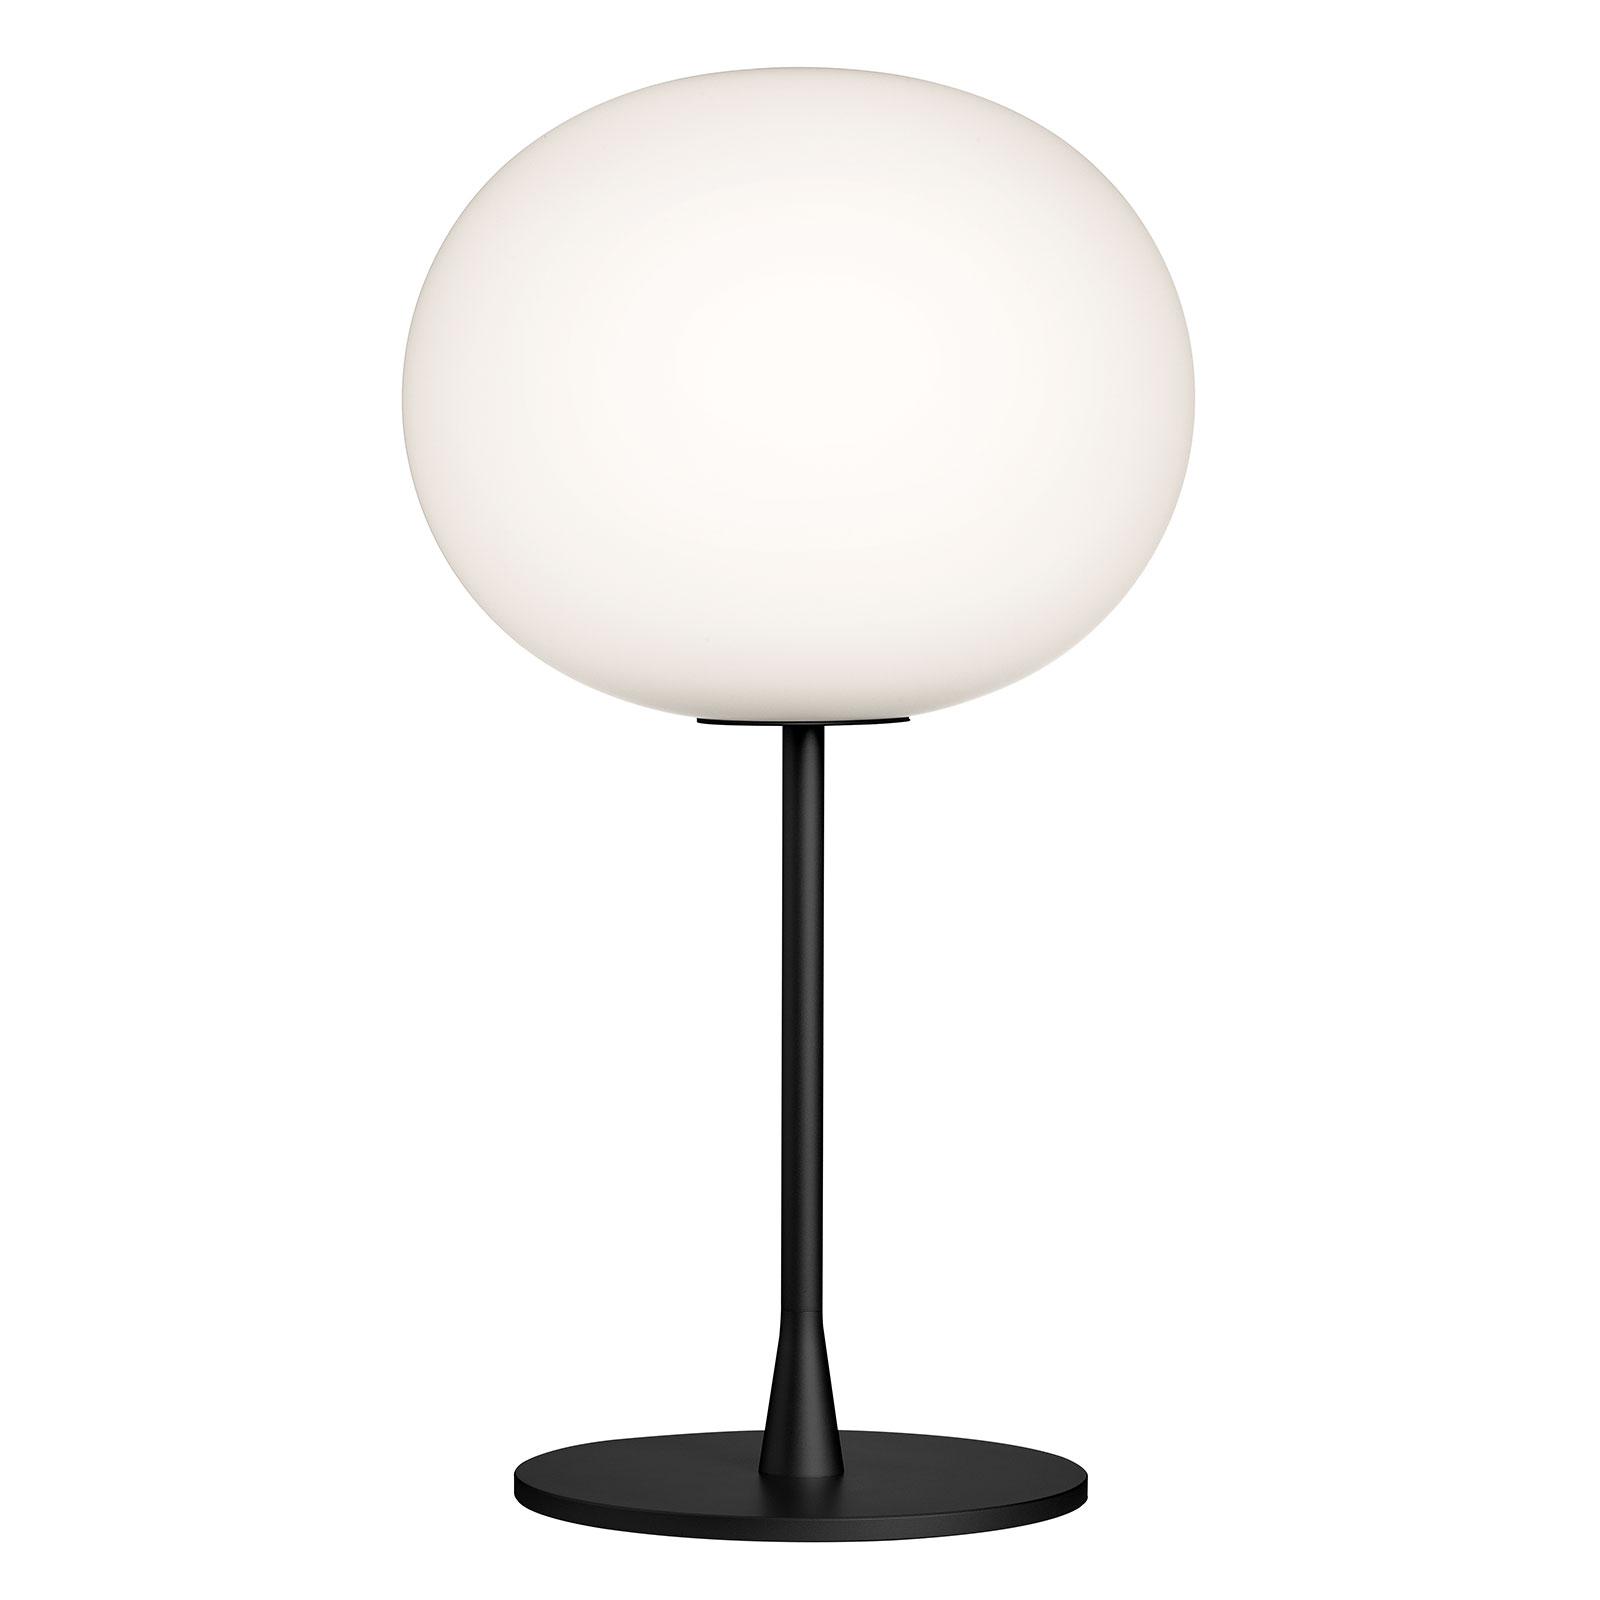 FLOS Glo-Ball T1 bordlampe, svart